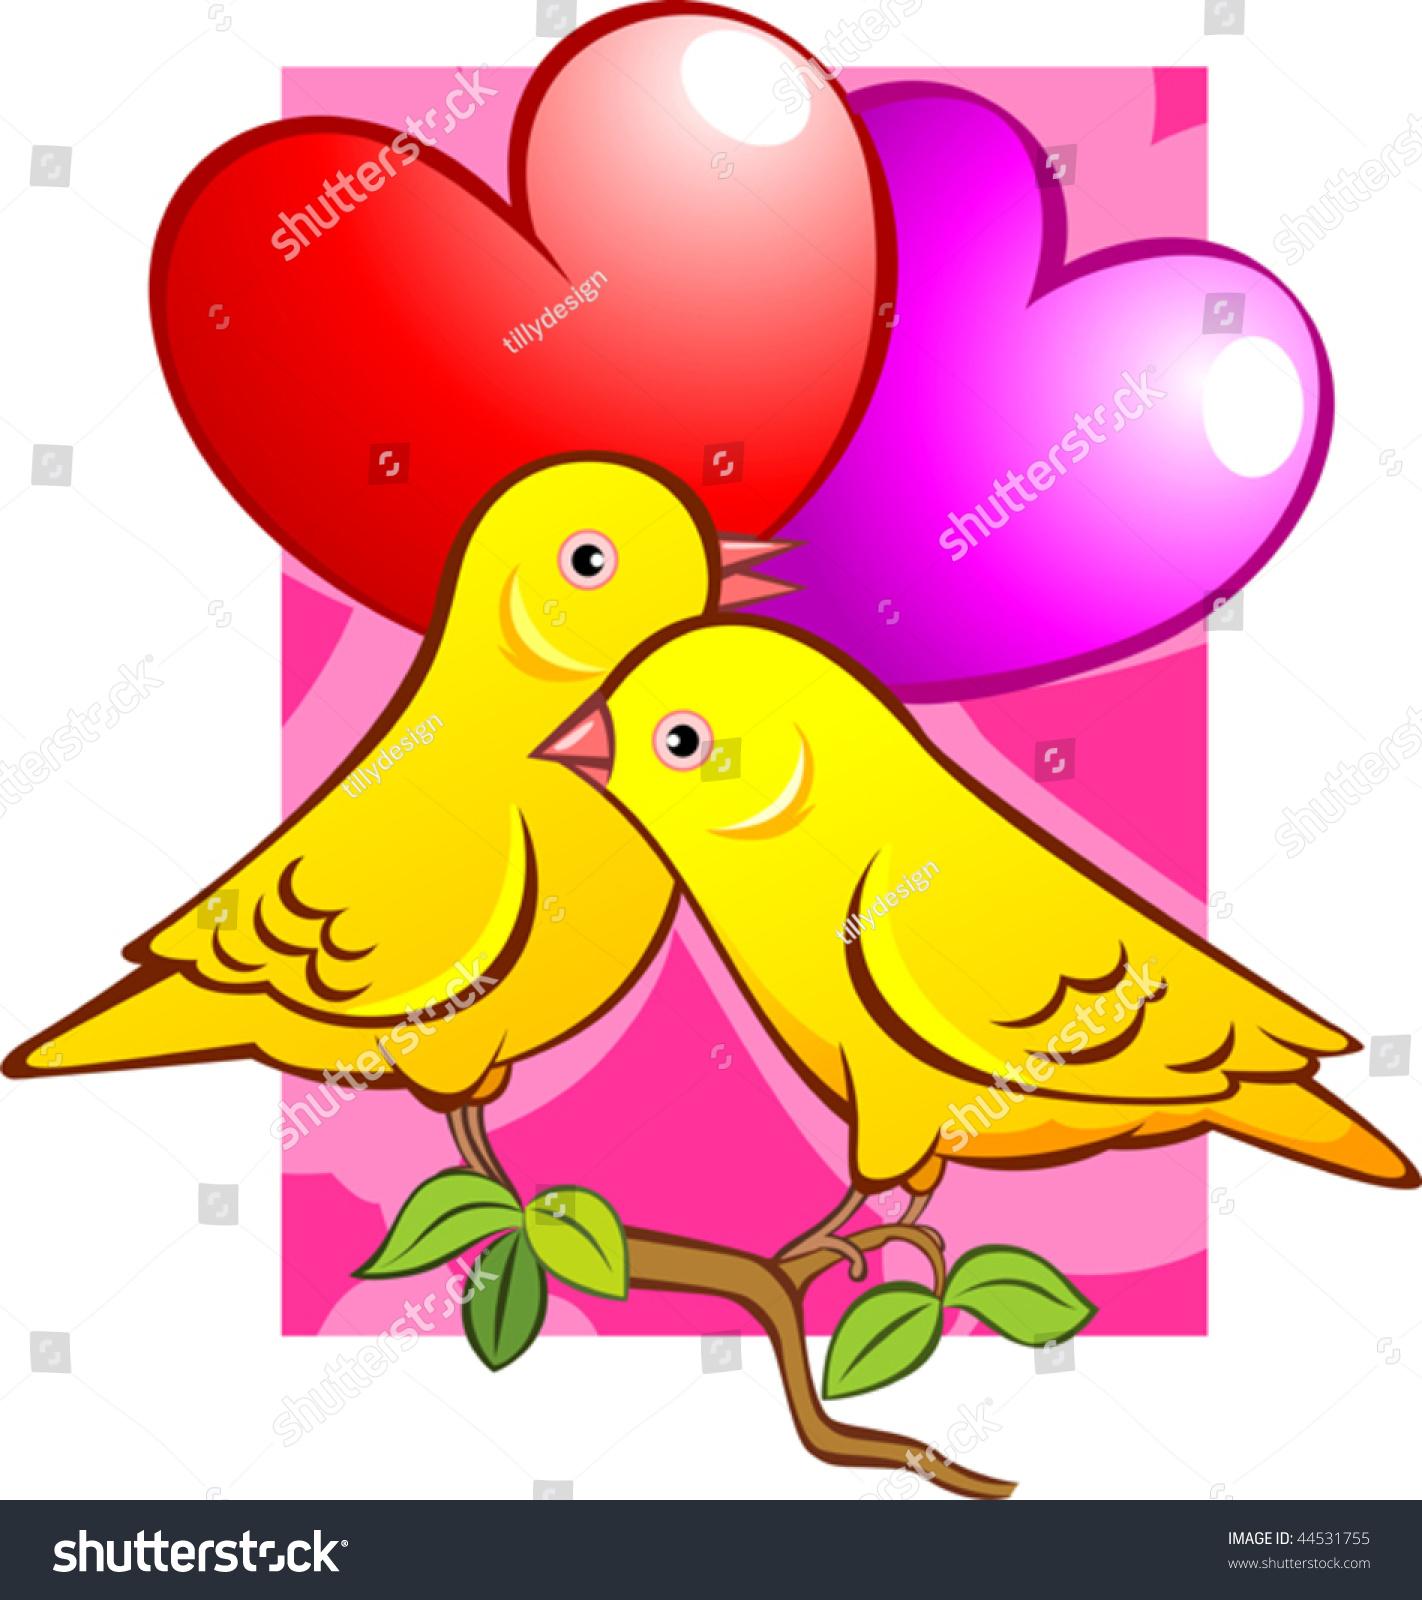 Illustration love symbols two birds stock vector 44531755 shutterstock illustration of love symbols with two birds buycottarizona Gallery